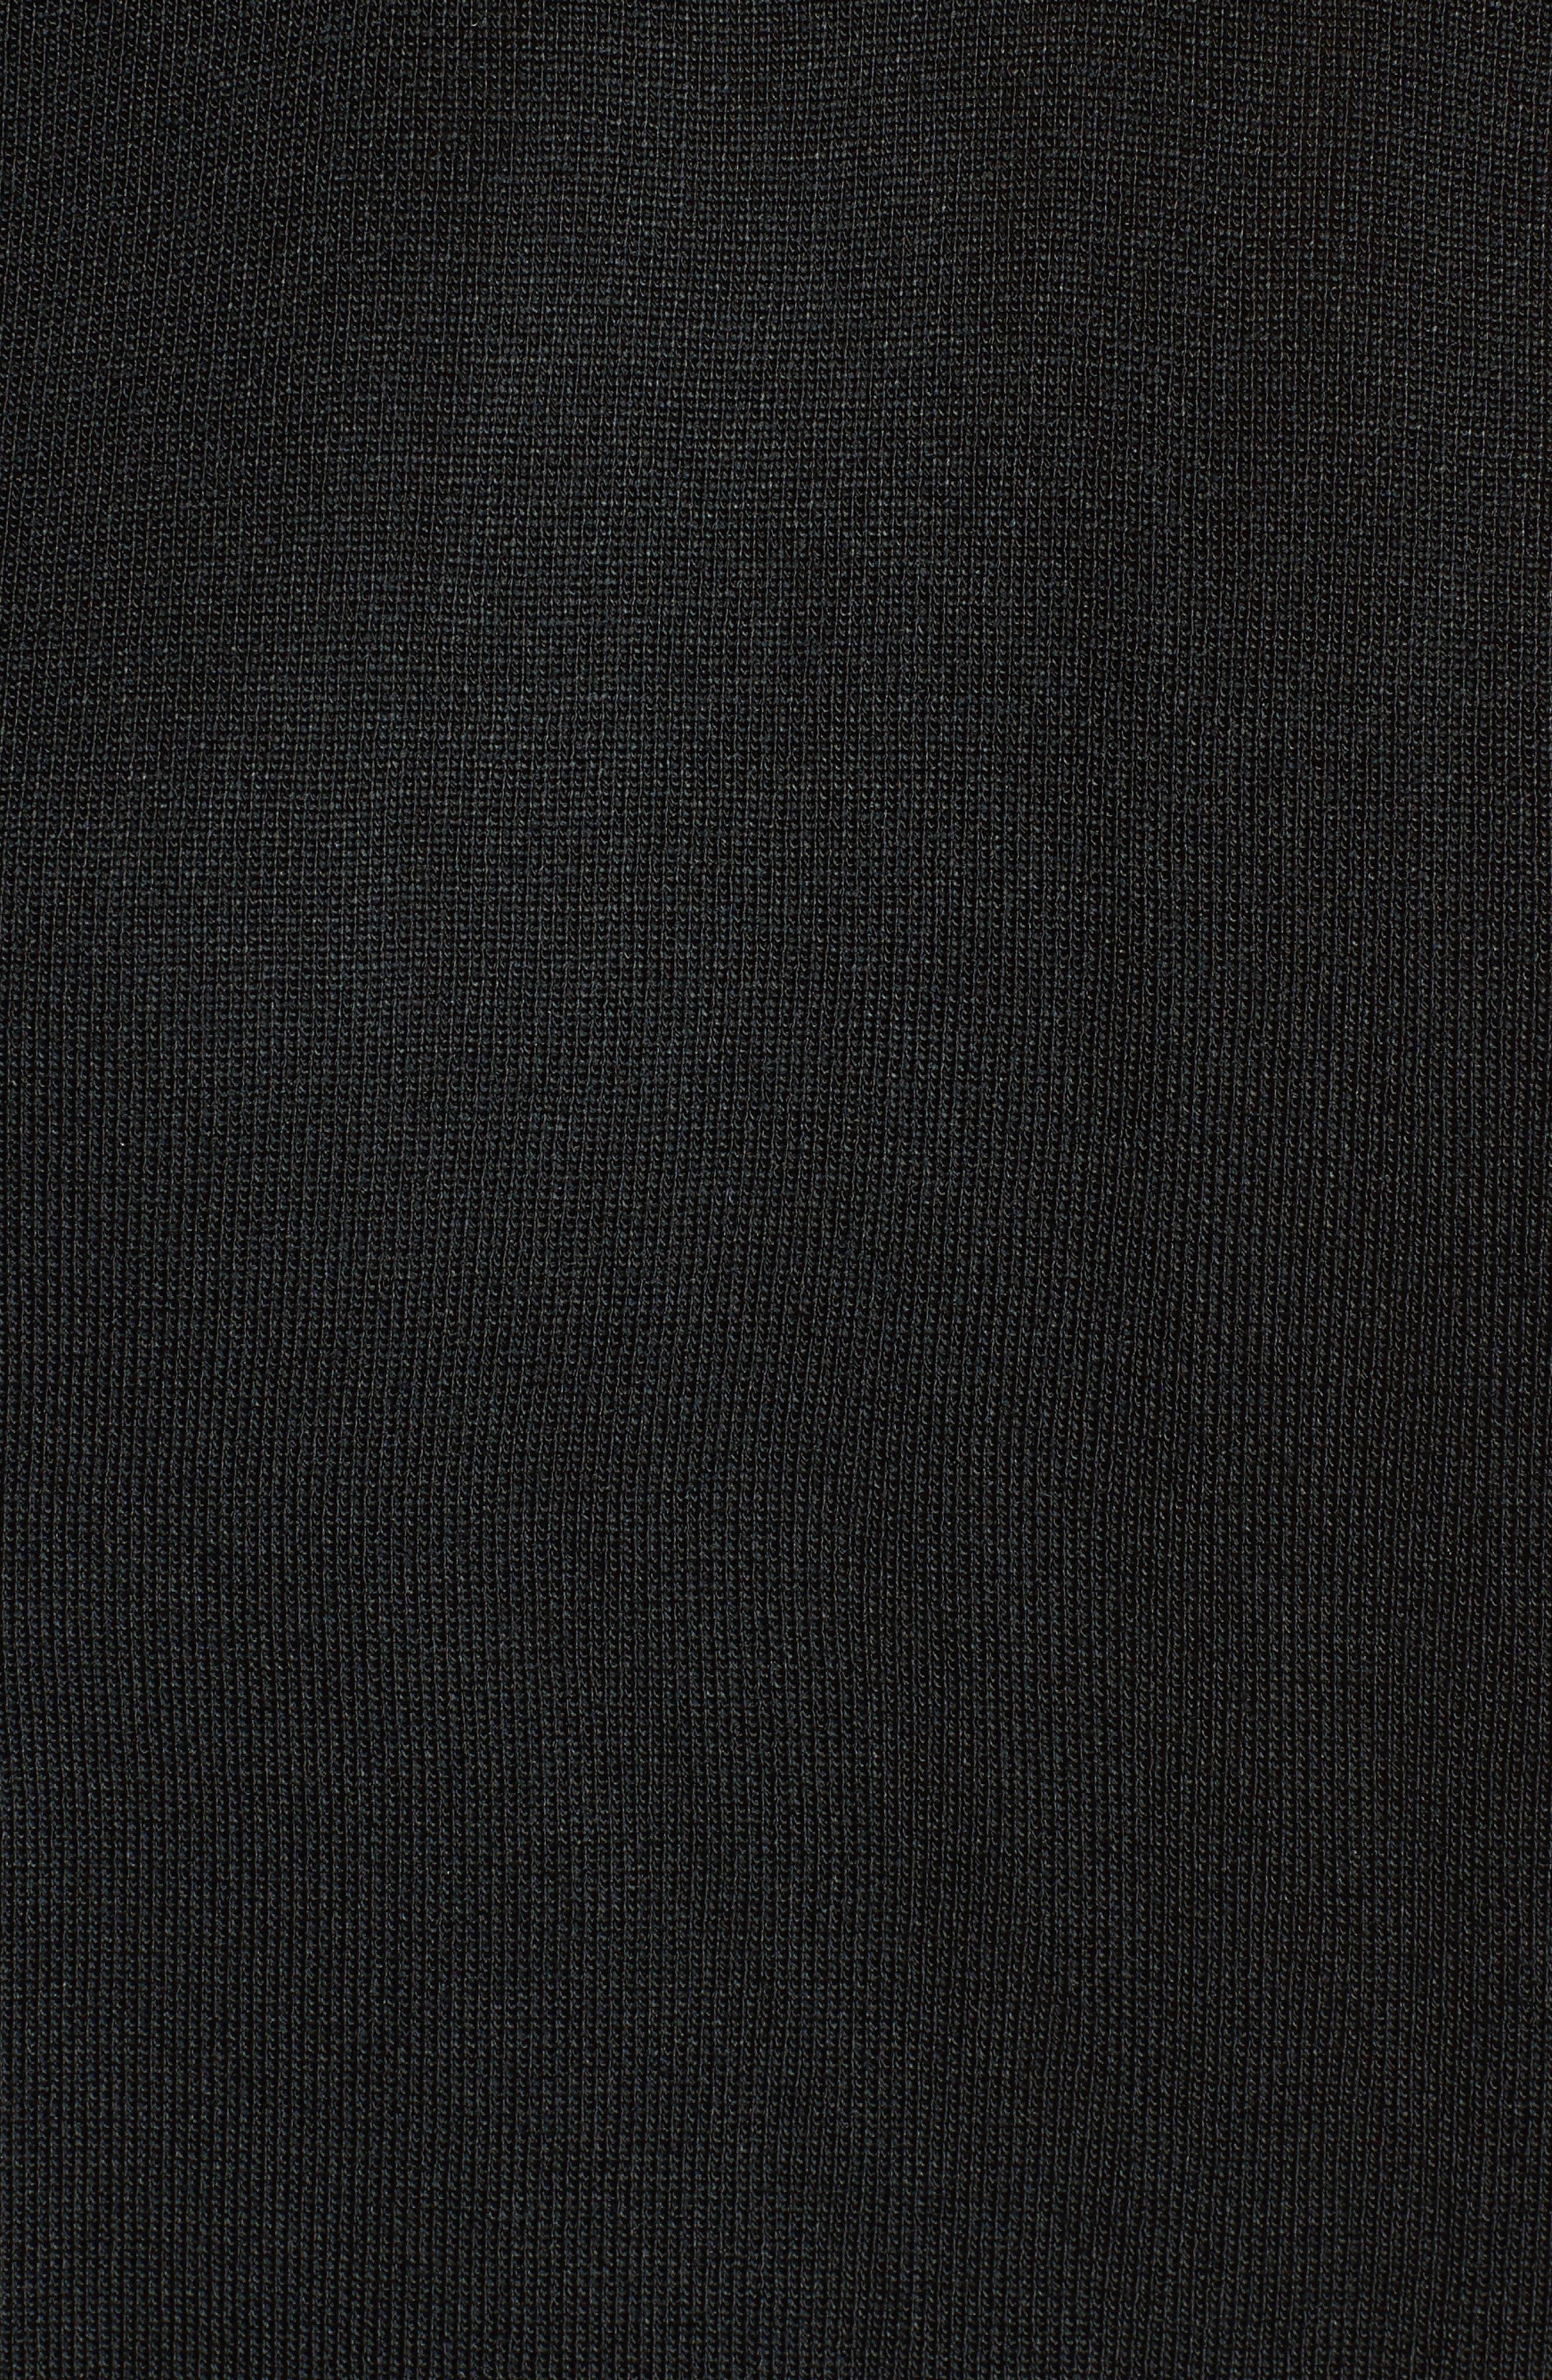 Sweetheart Neck Tank,                             Alternate thumbnail 5, color,                             BLACK